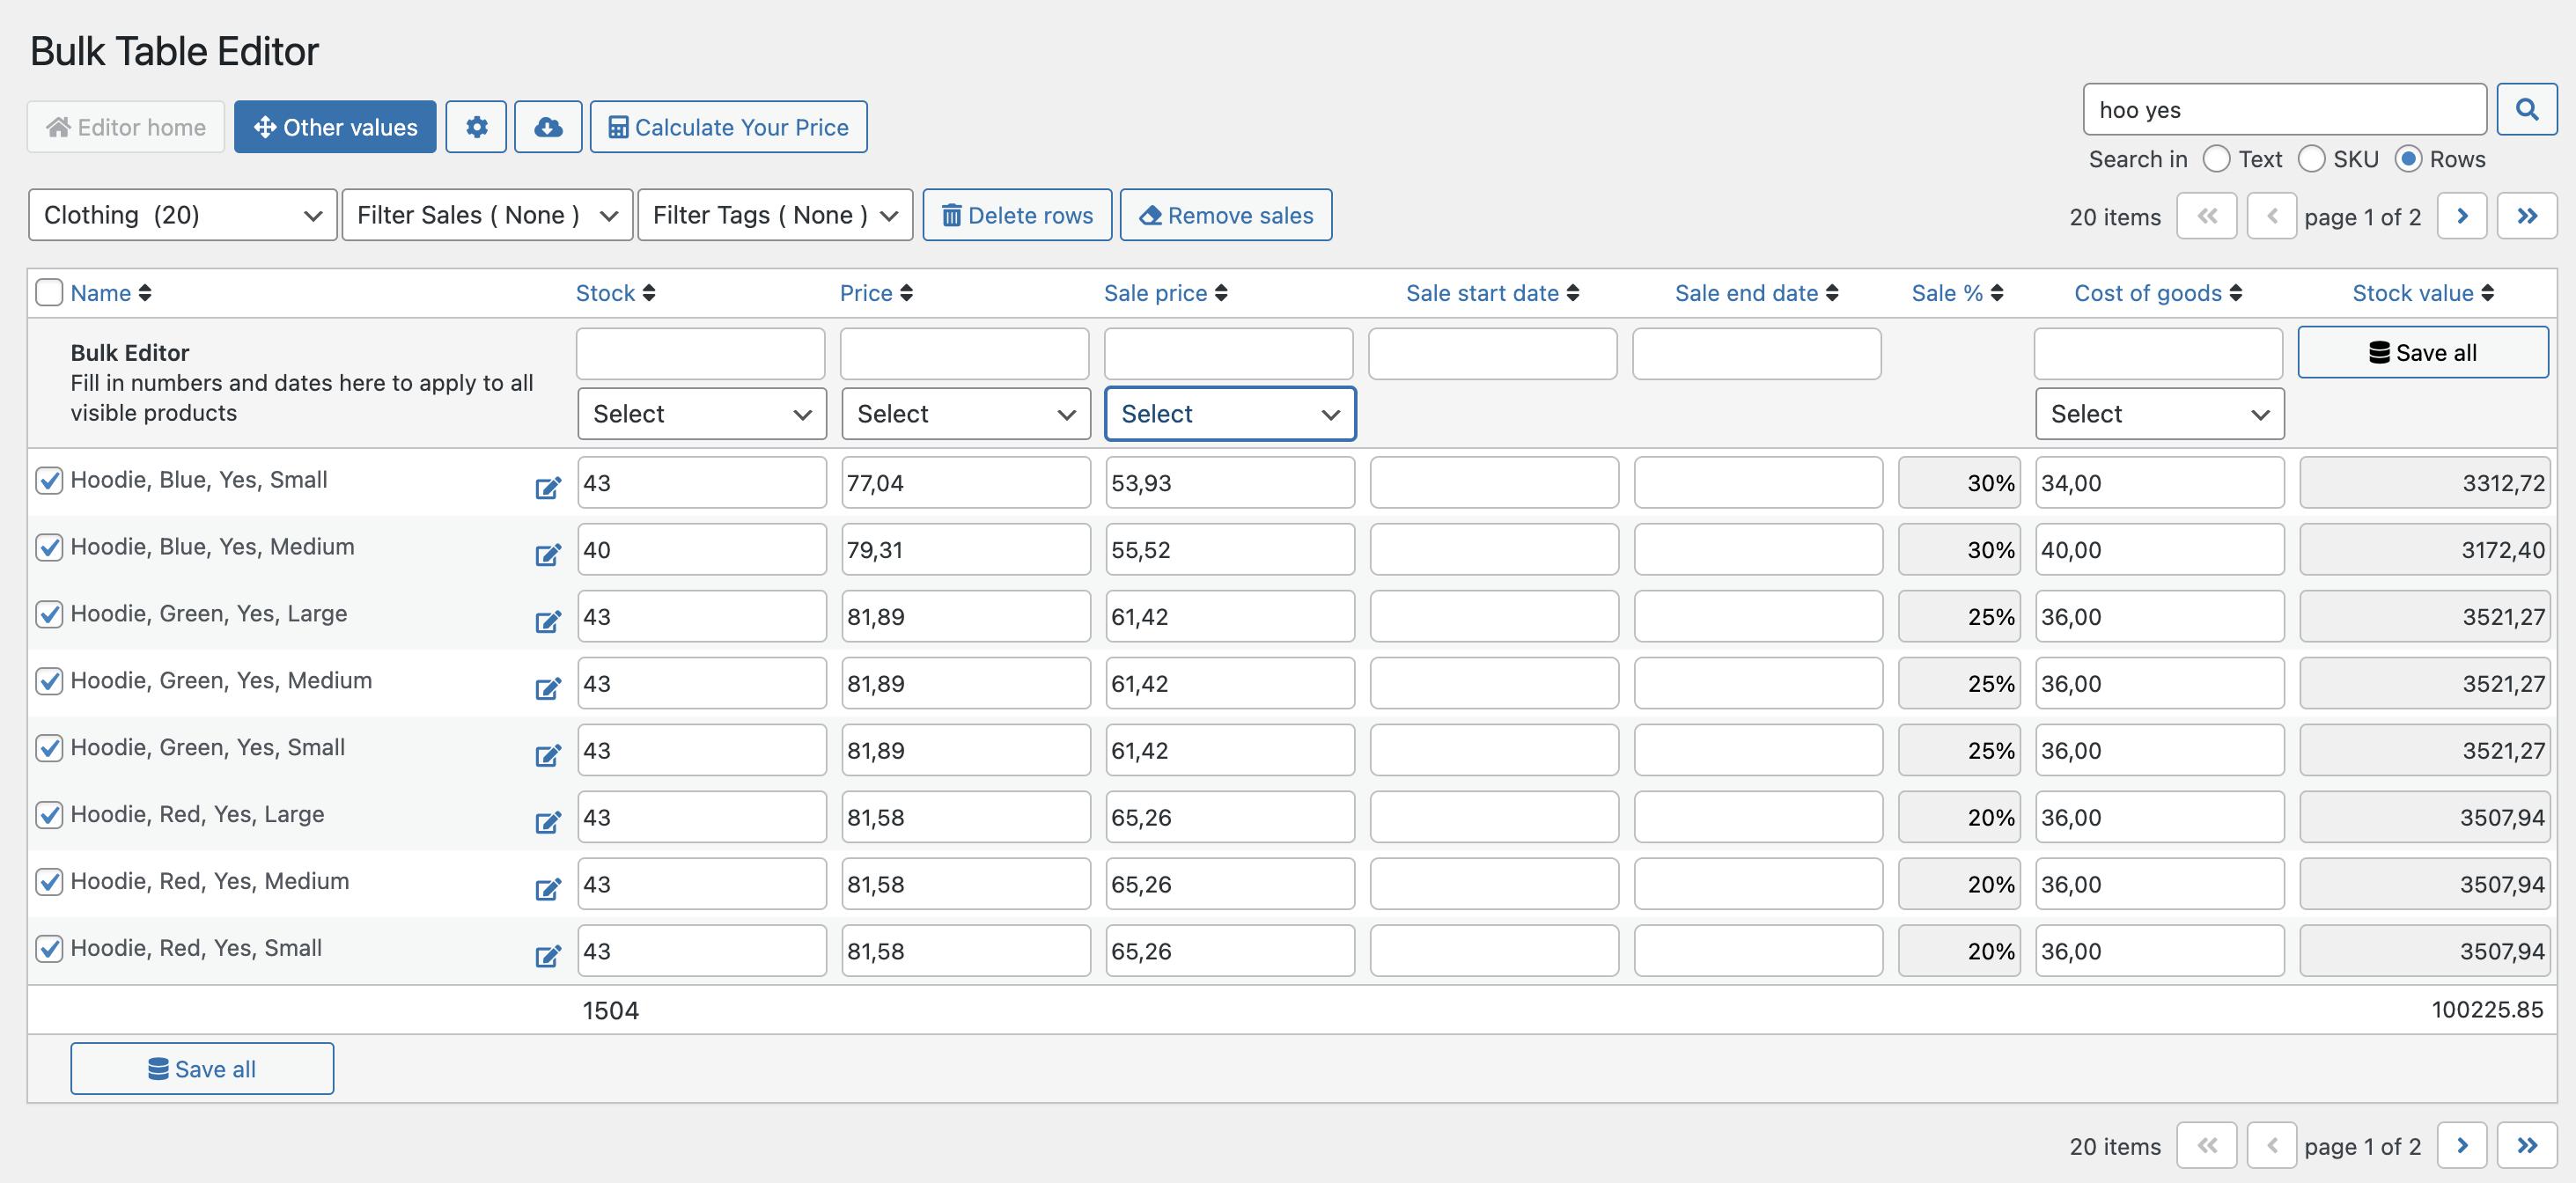 Bulk Table Editor - sales history